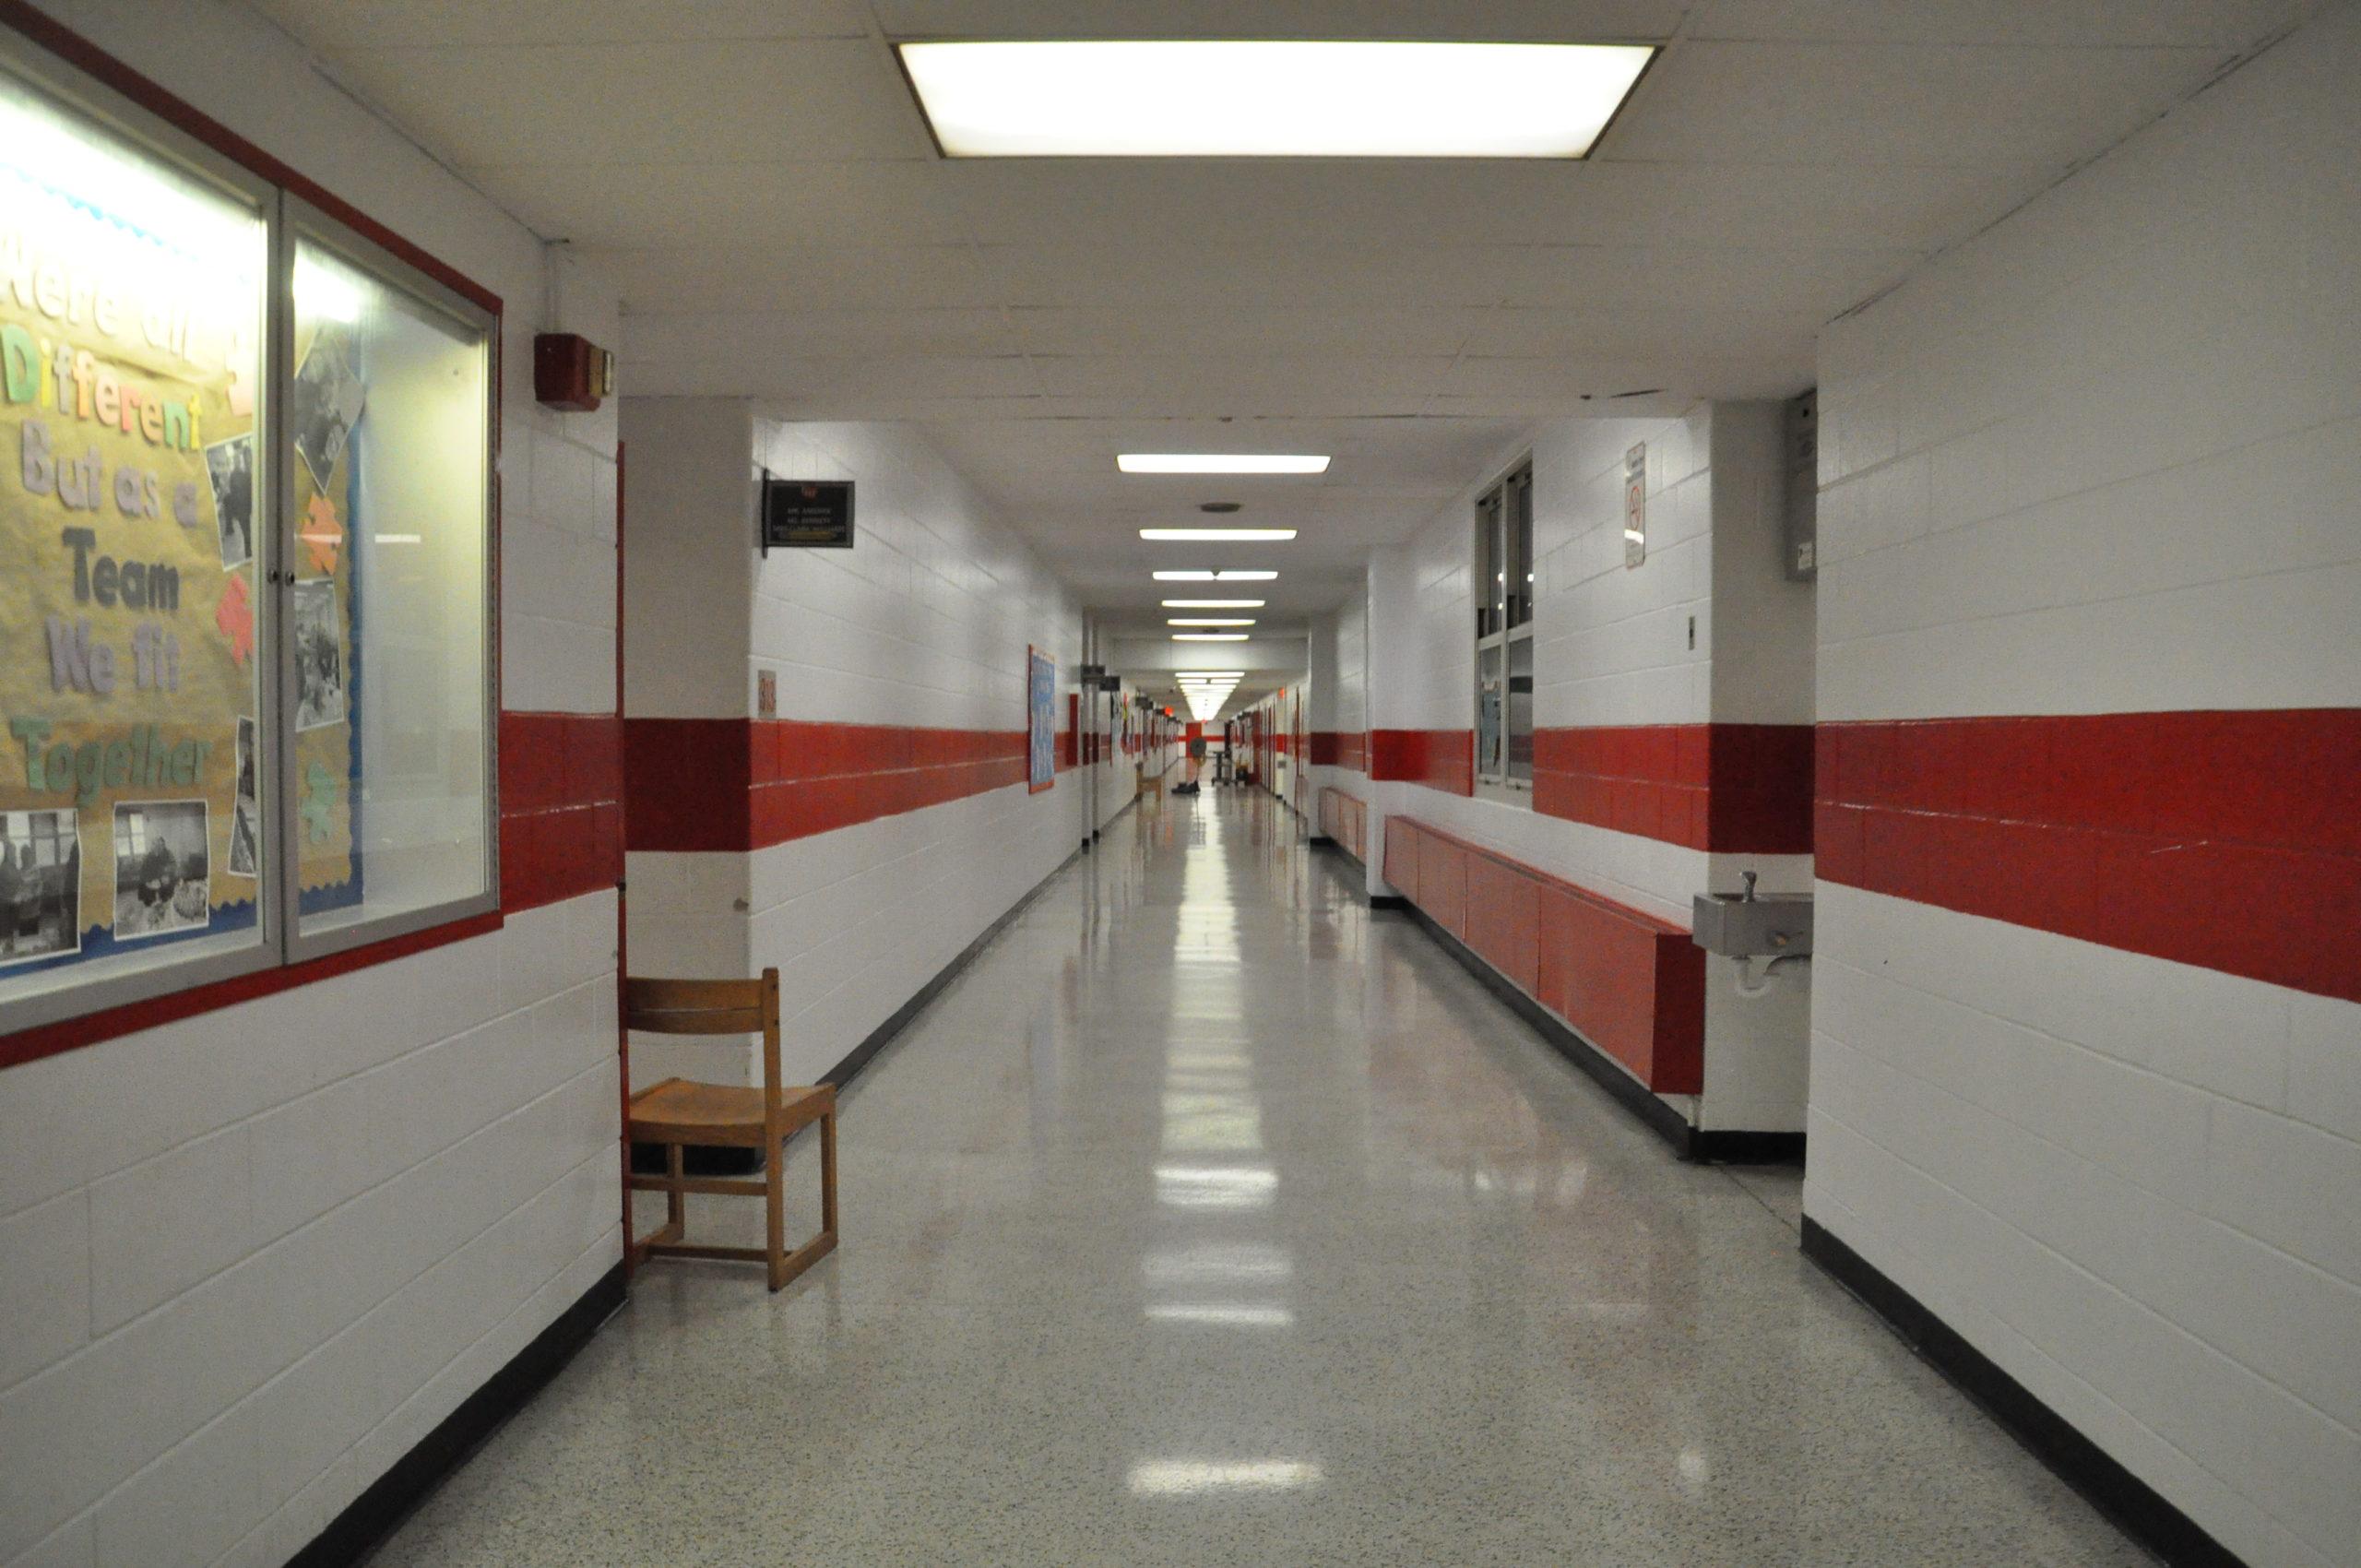 Both Leland Goodson Sewell and Karaji Jones attended Spencer Miller Community School in Newark's Central Ward.